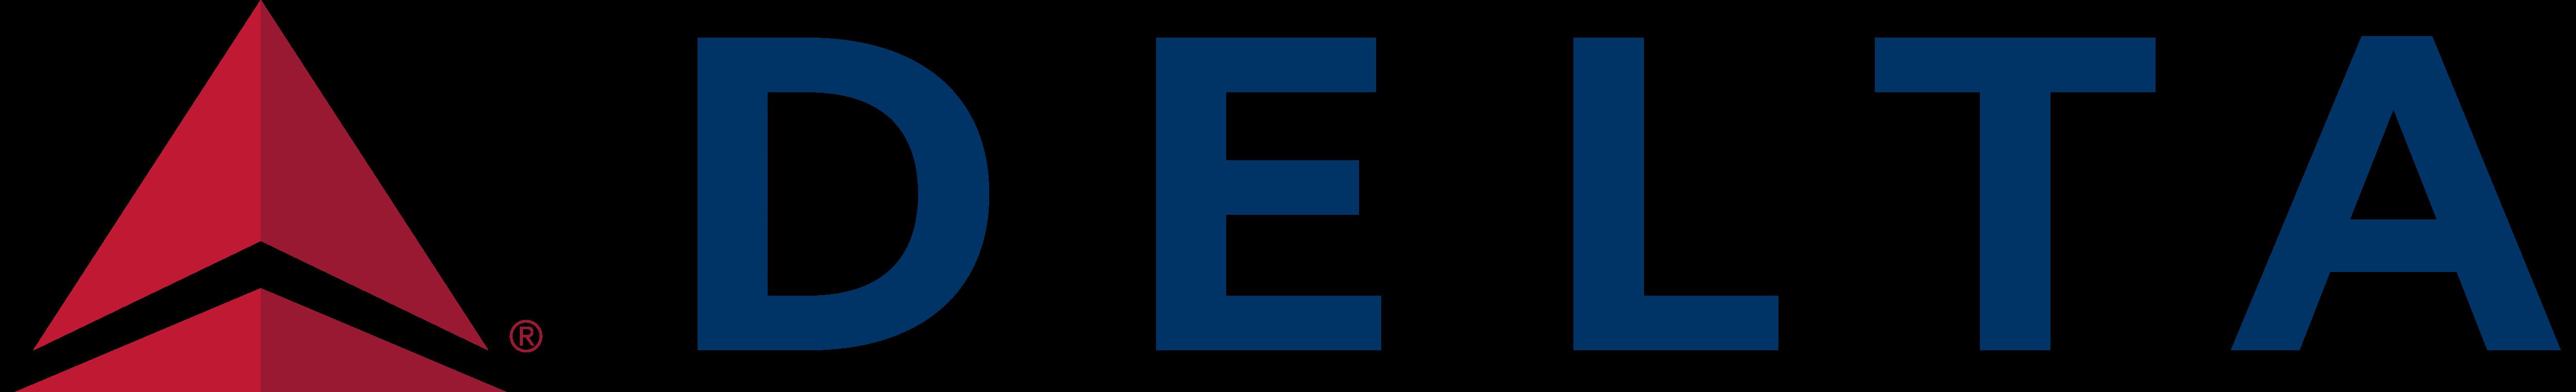 delta air lines � logos download